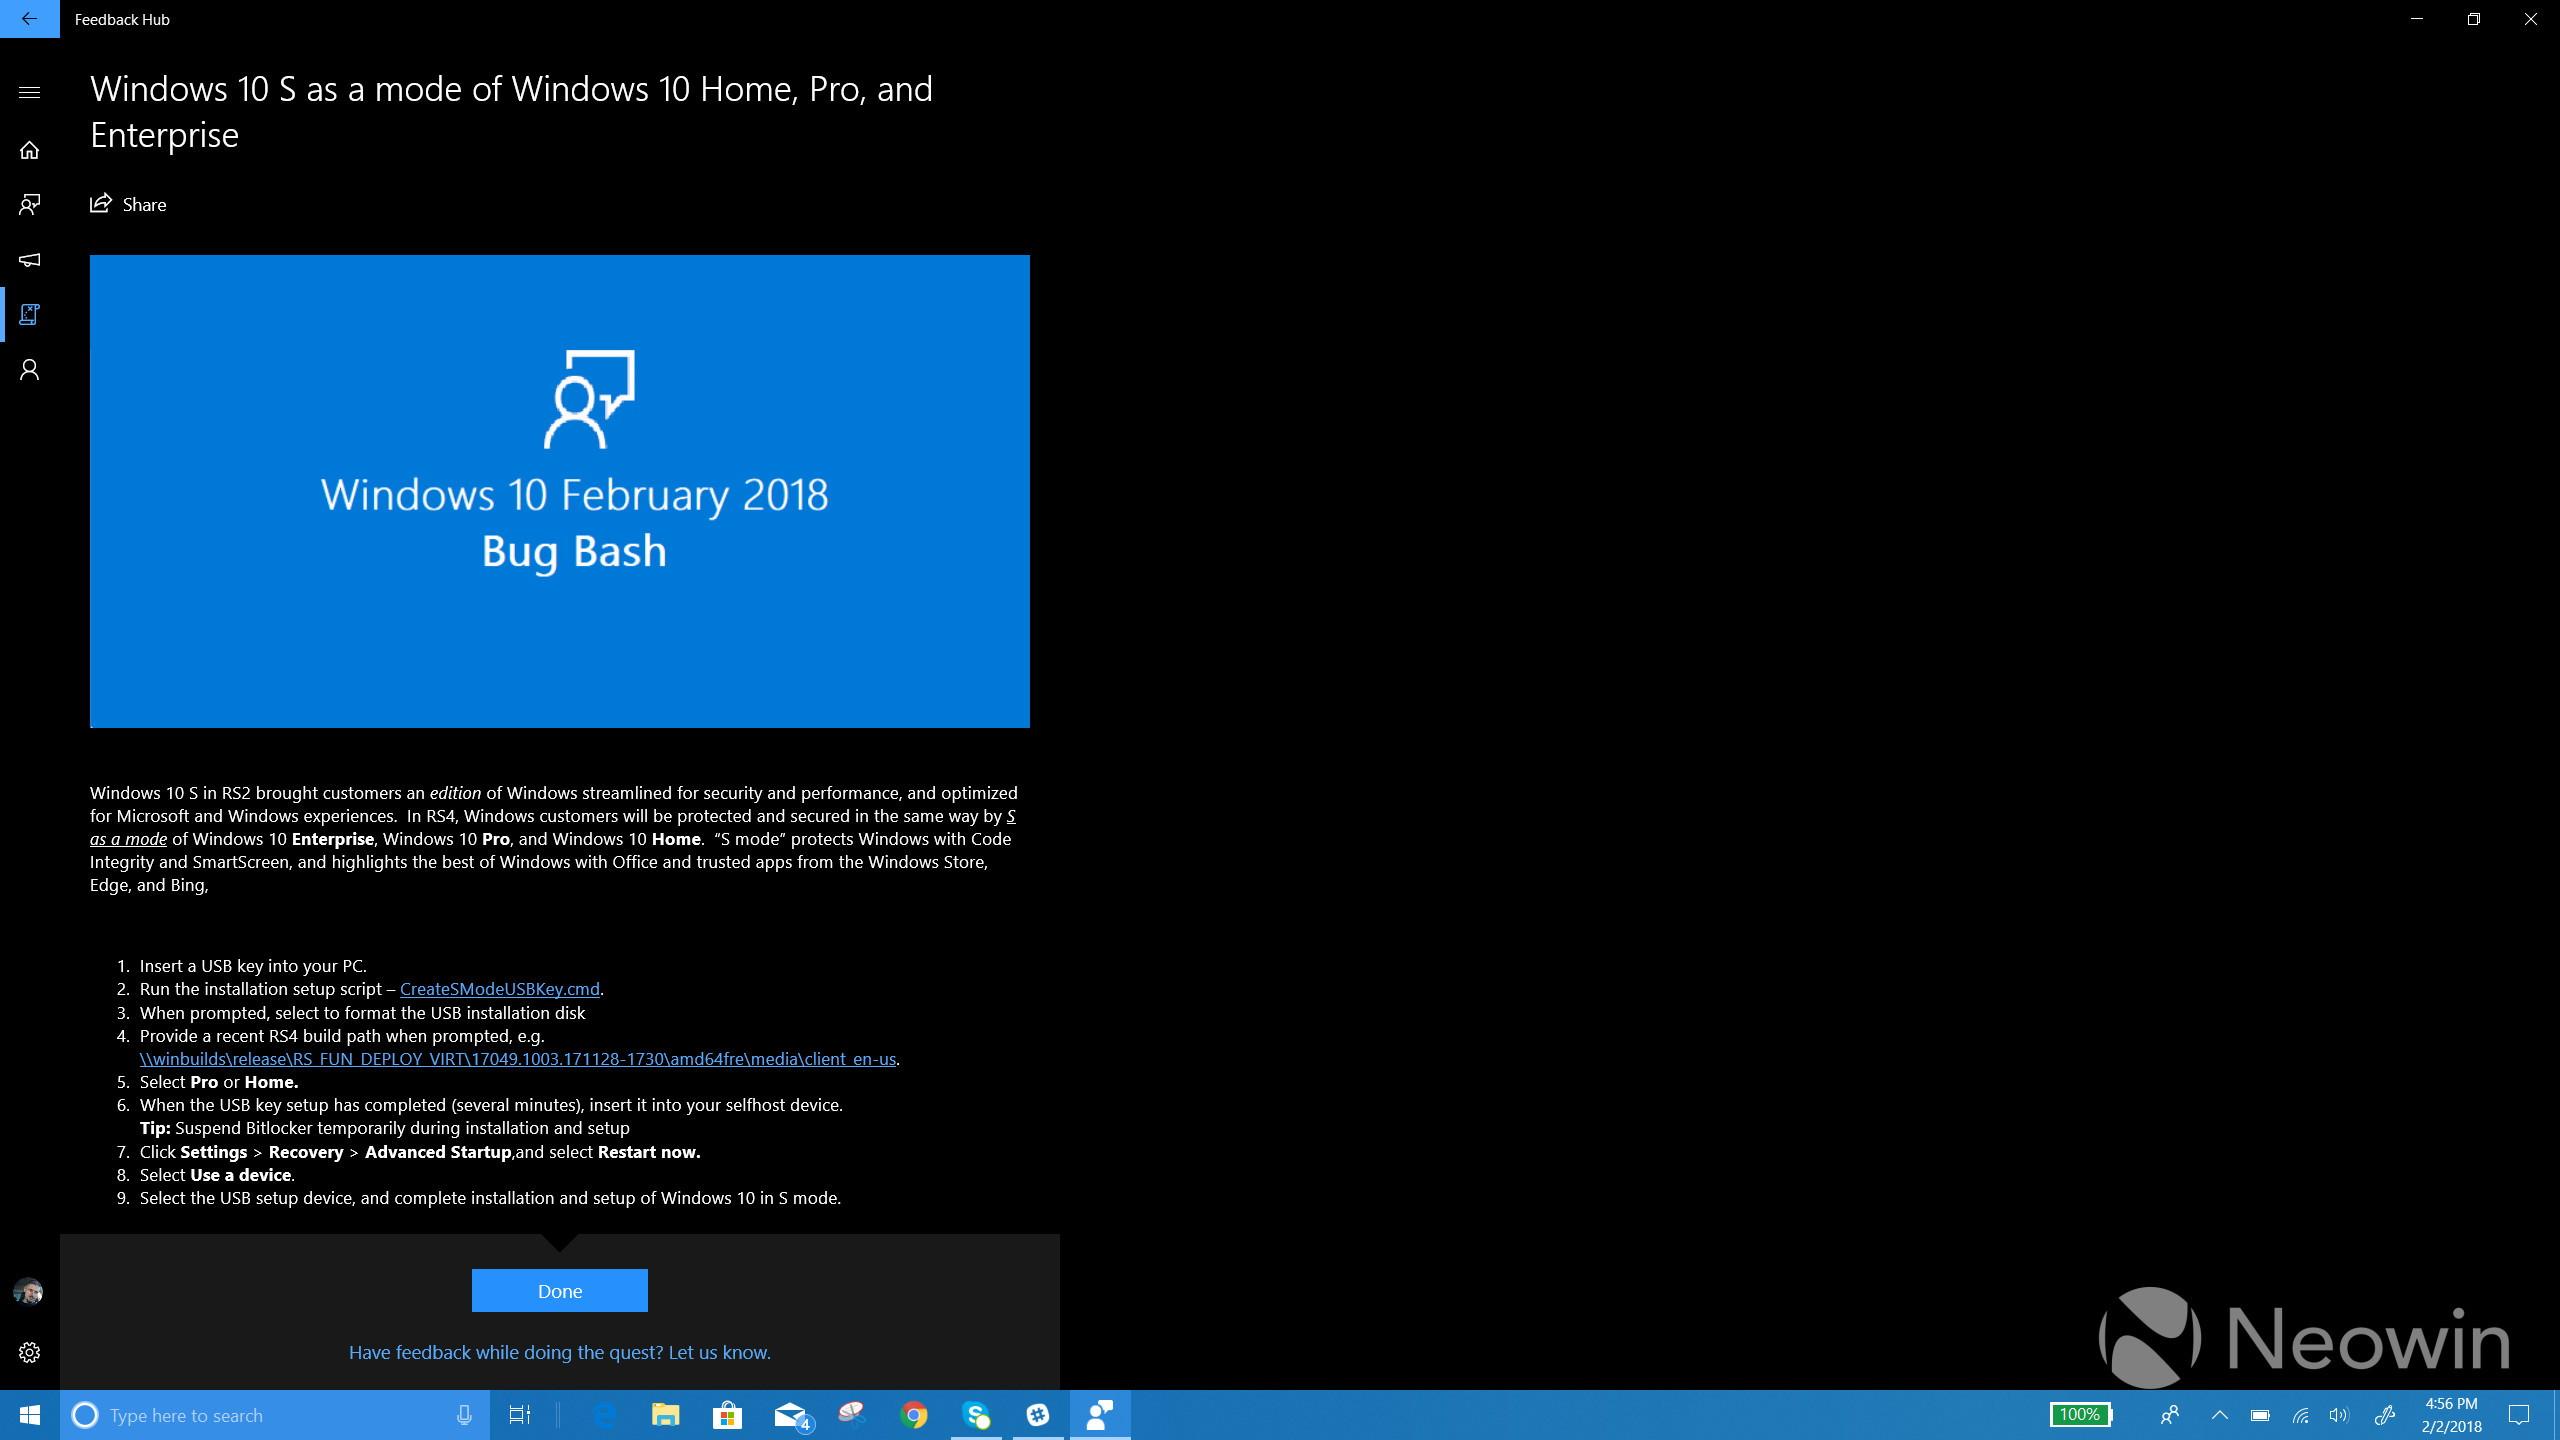 Microsoft ersetzt Windows 10 S